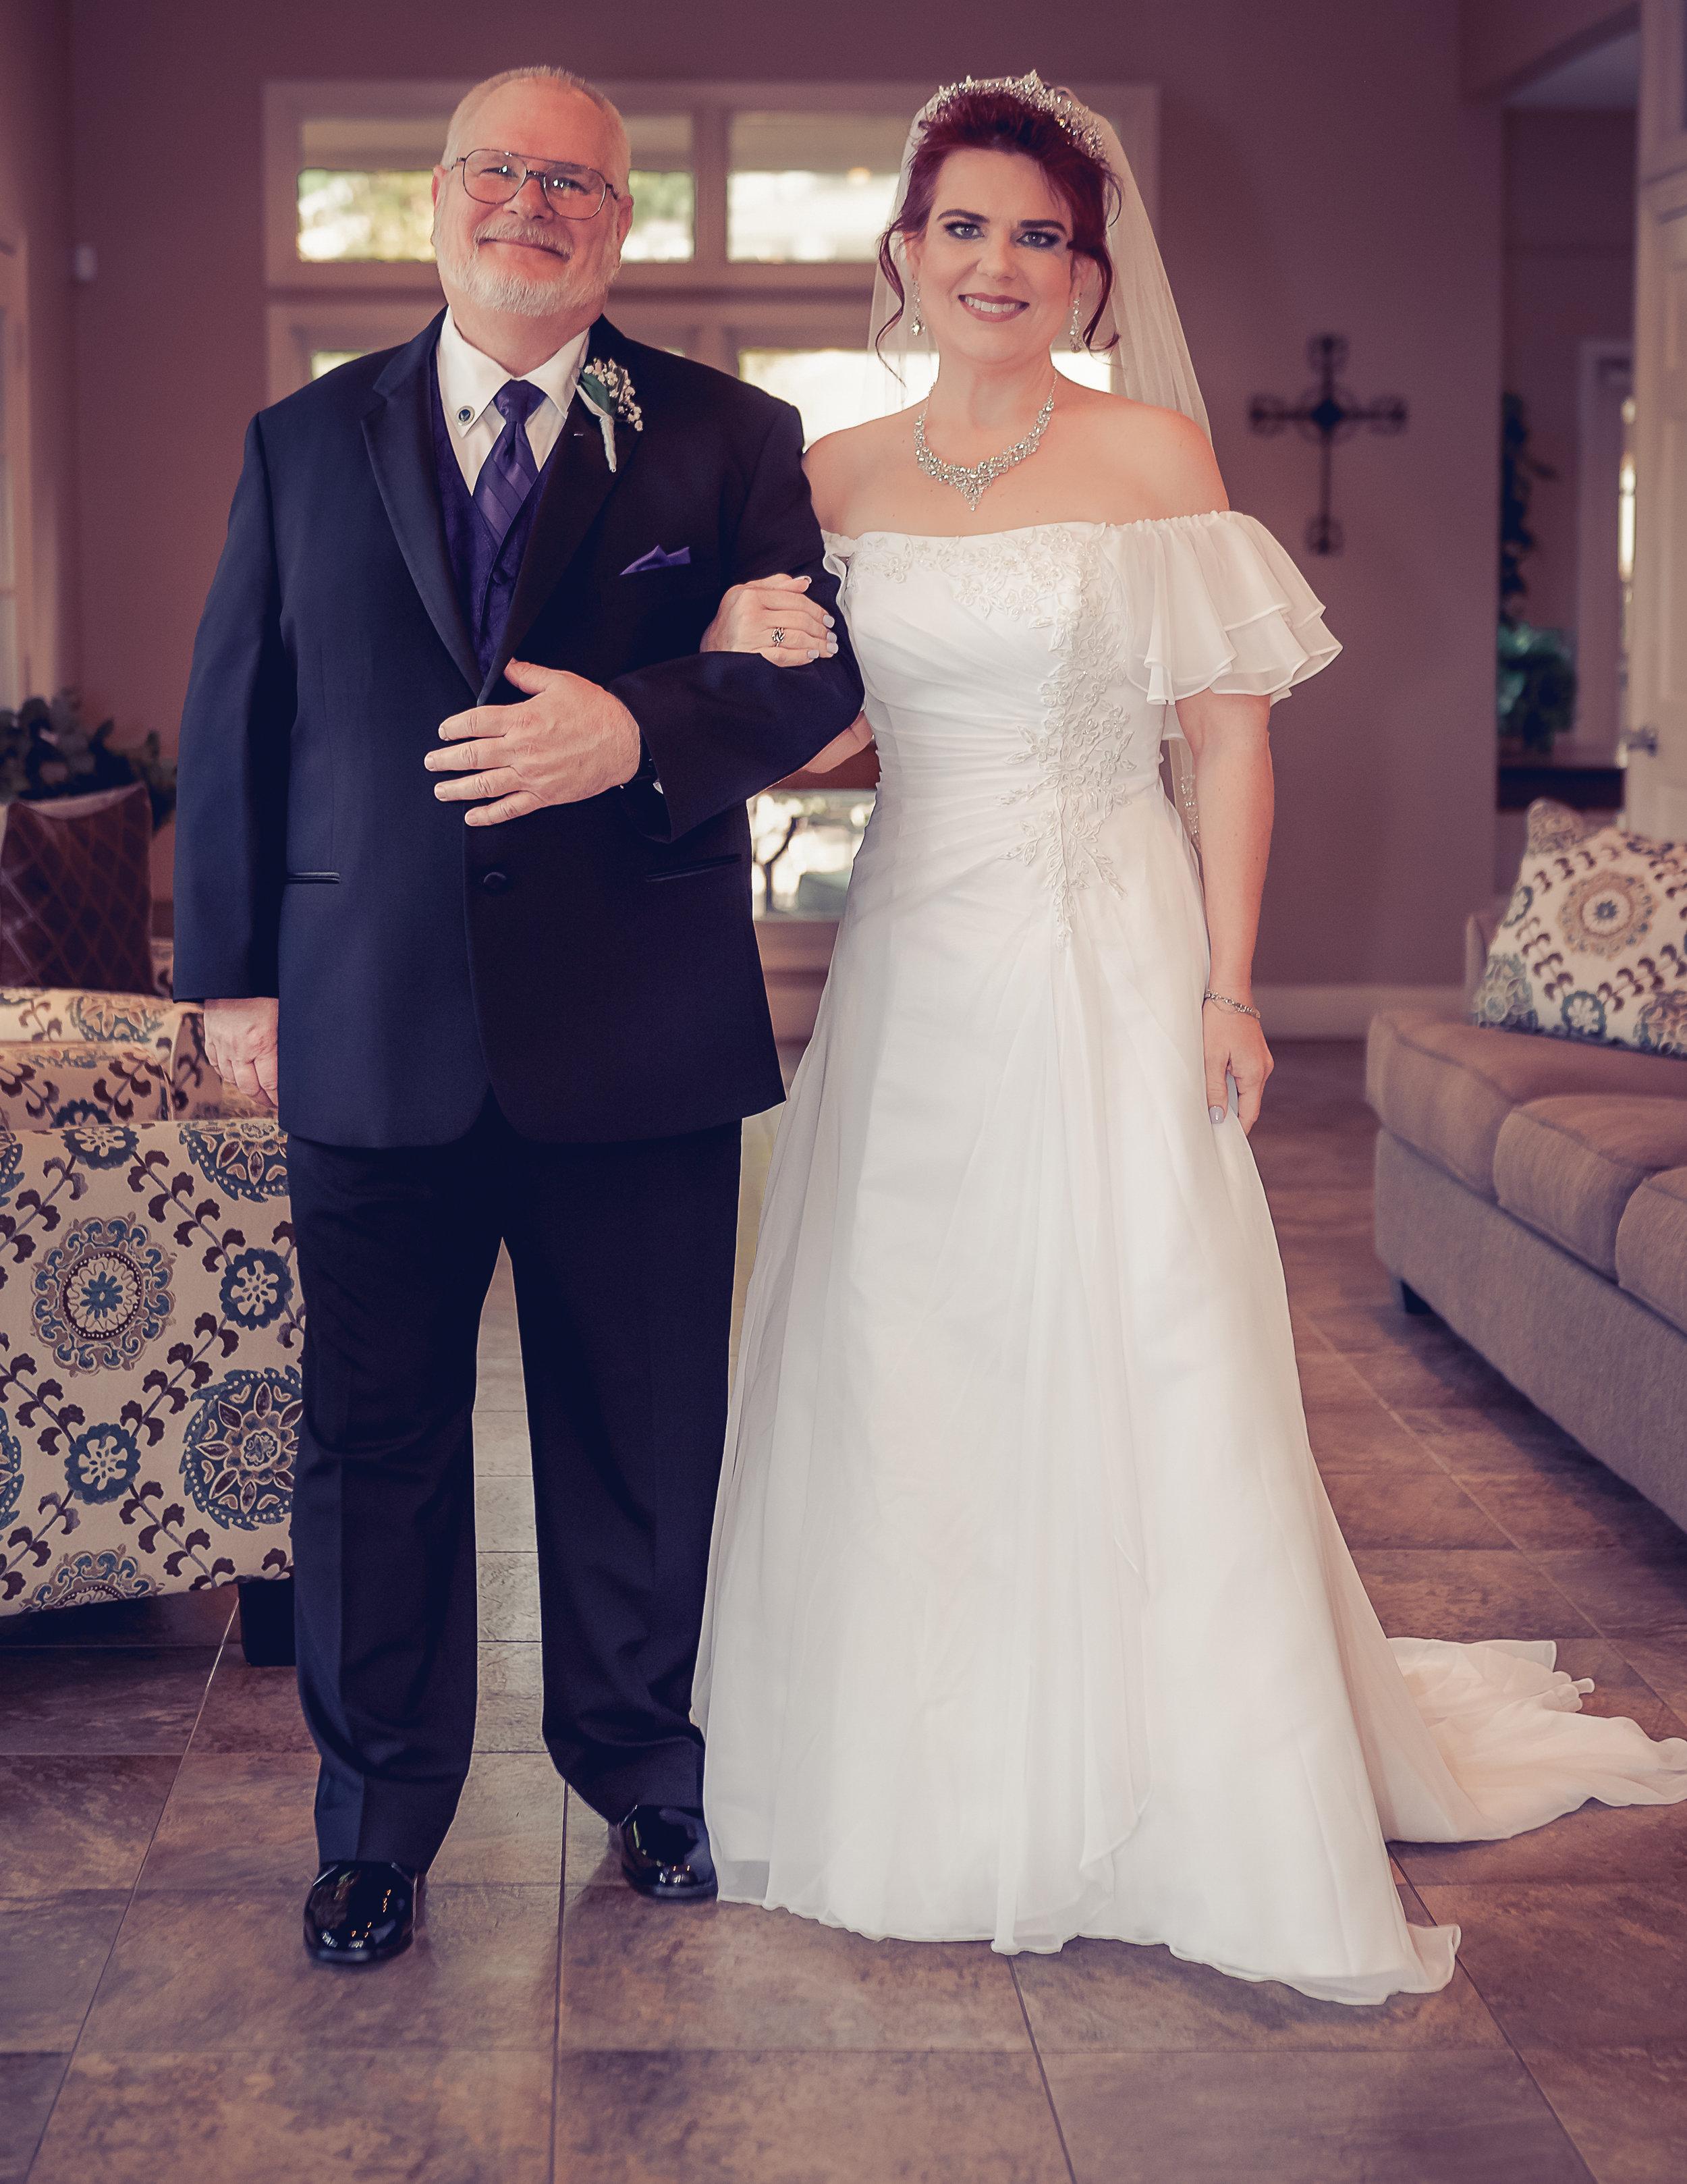 A&S_wedding__(1_of_9).jpg